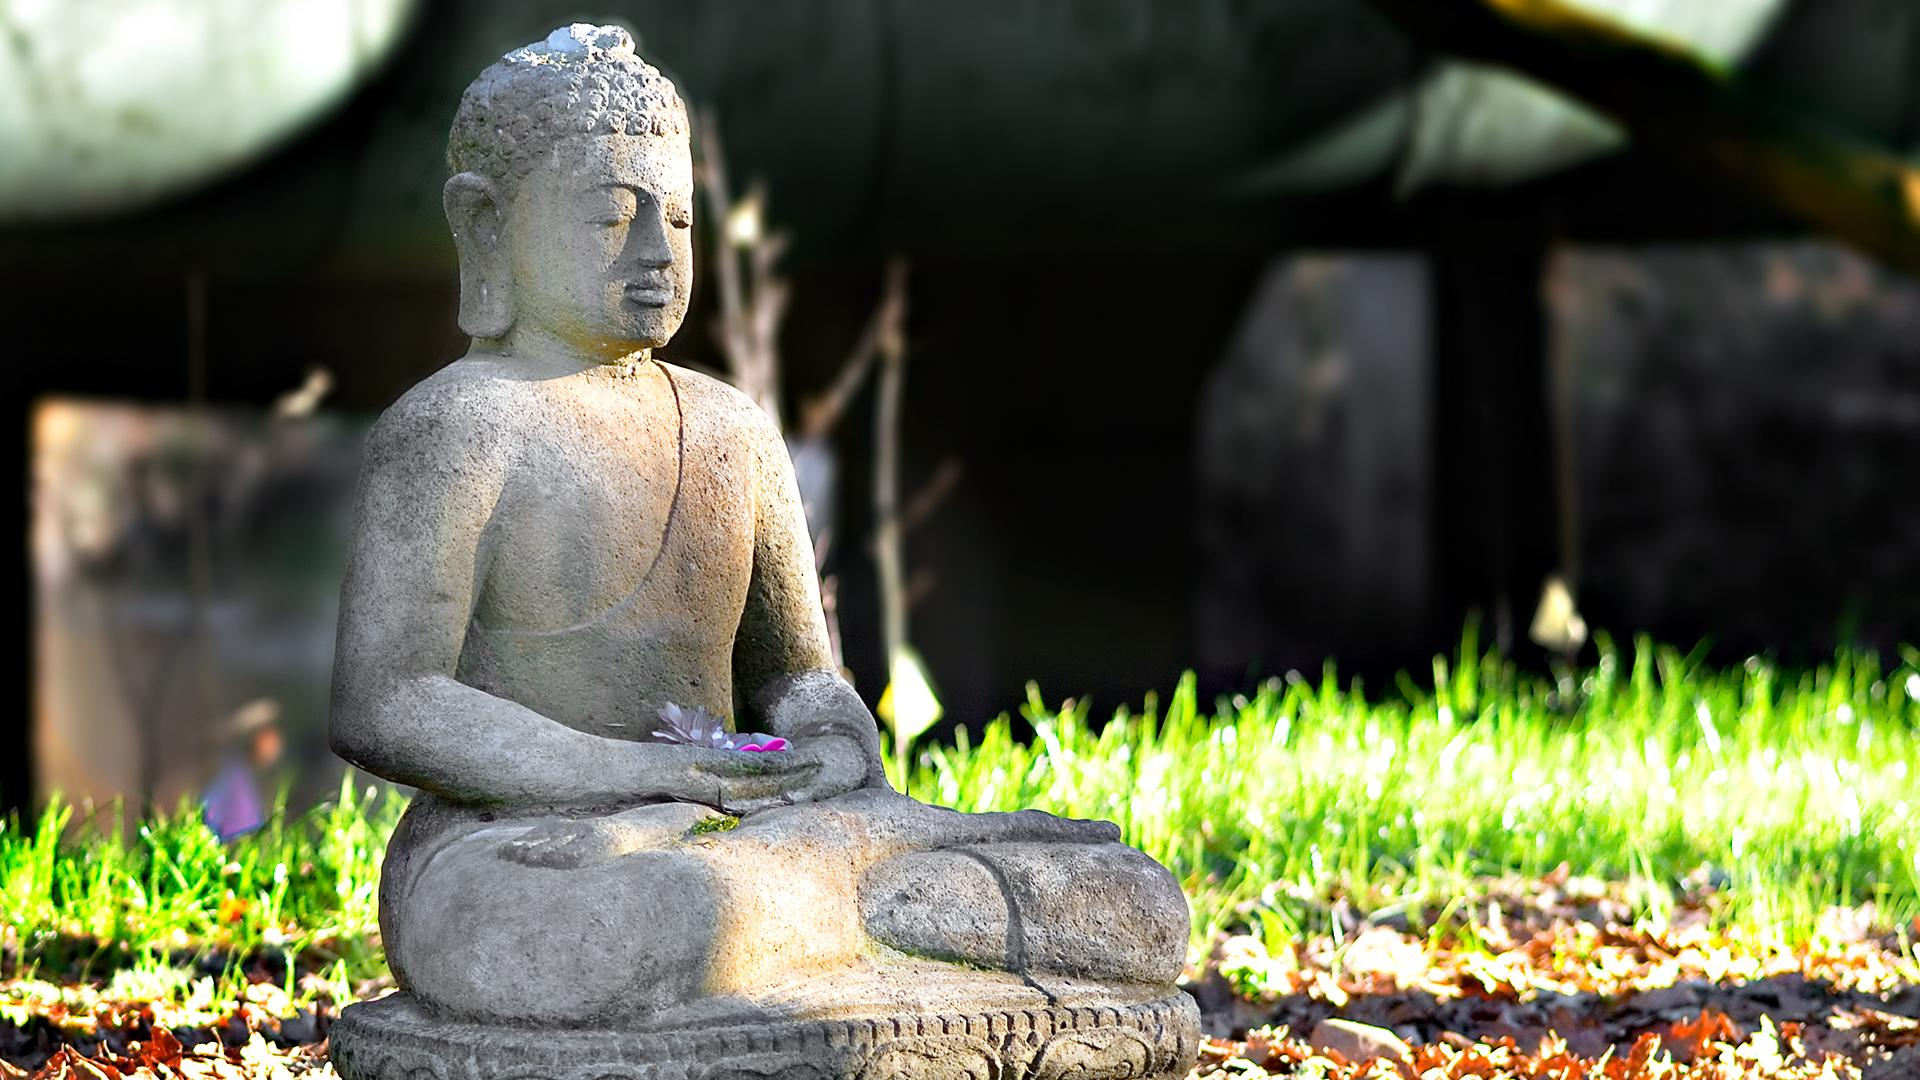 meditation buddha wallpaper 53134